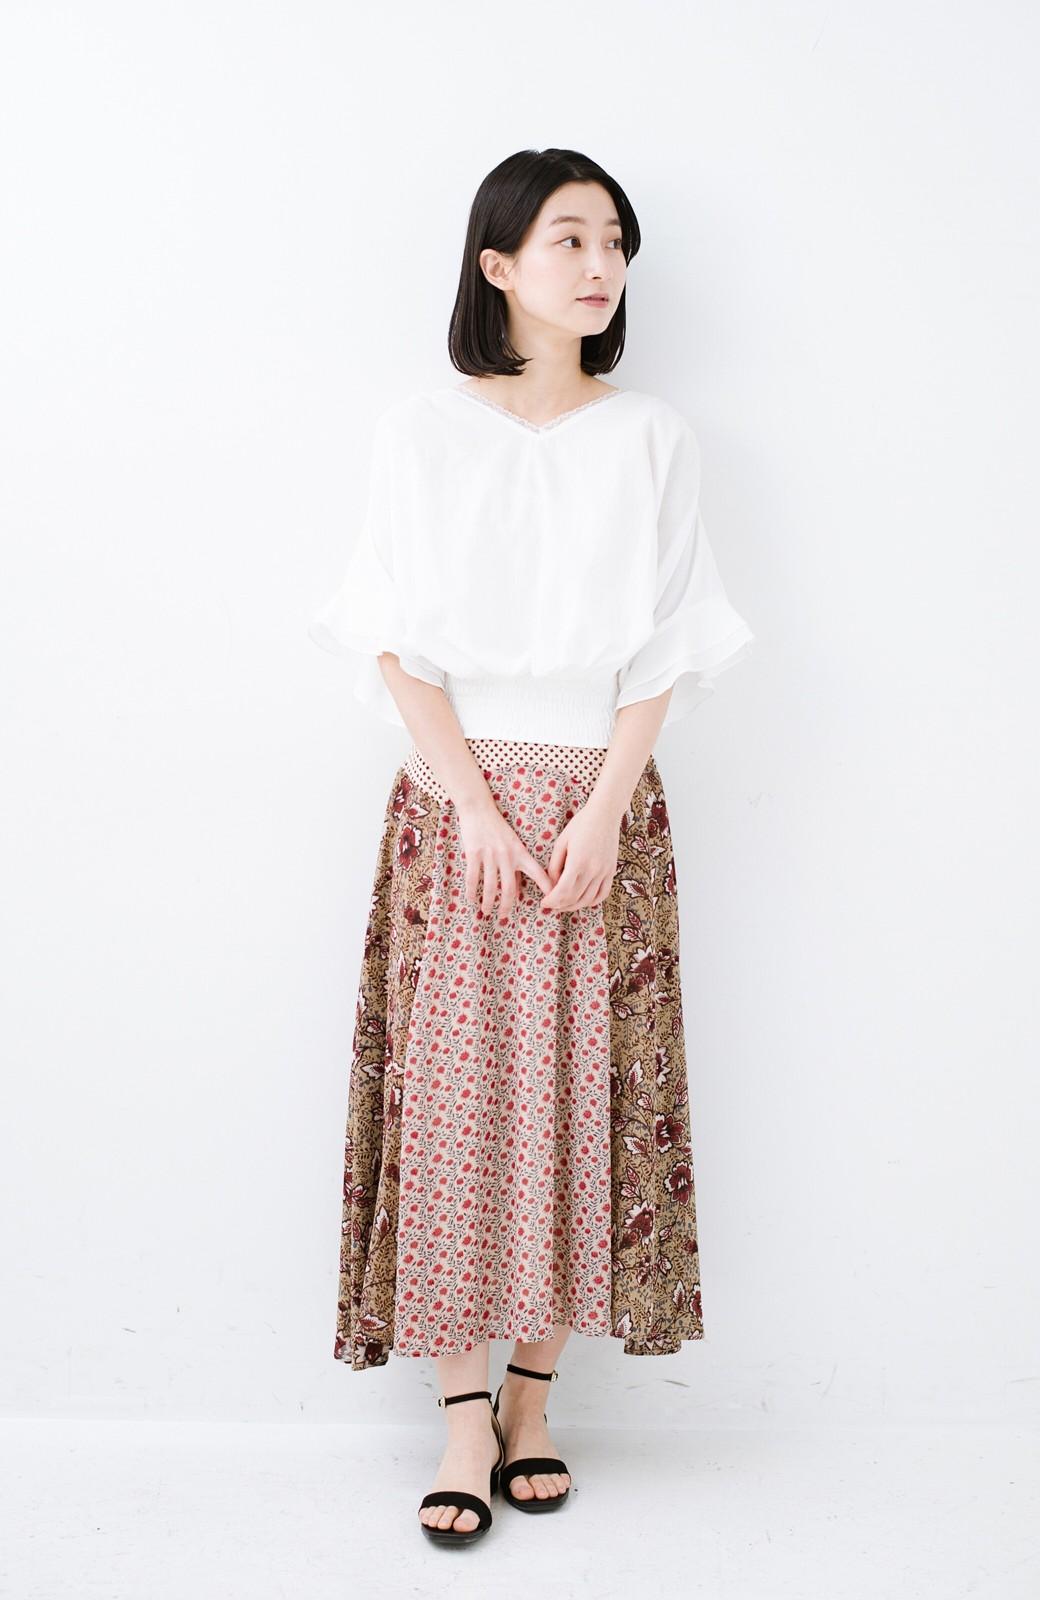 haco! 【洗濯機洗いOK】シンプルなトップスに合わせるだけでかわいくなれる MIX柄スカート <ベージュ系その他>の商品写真10